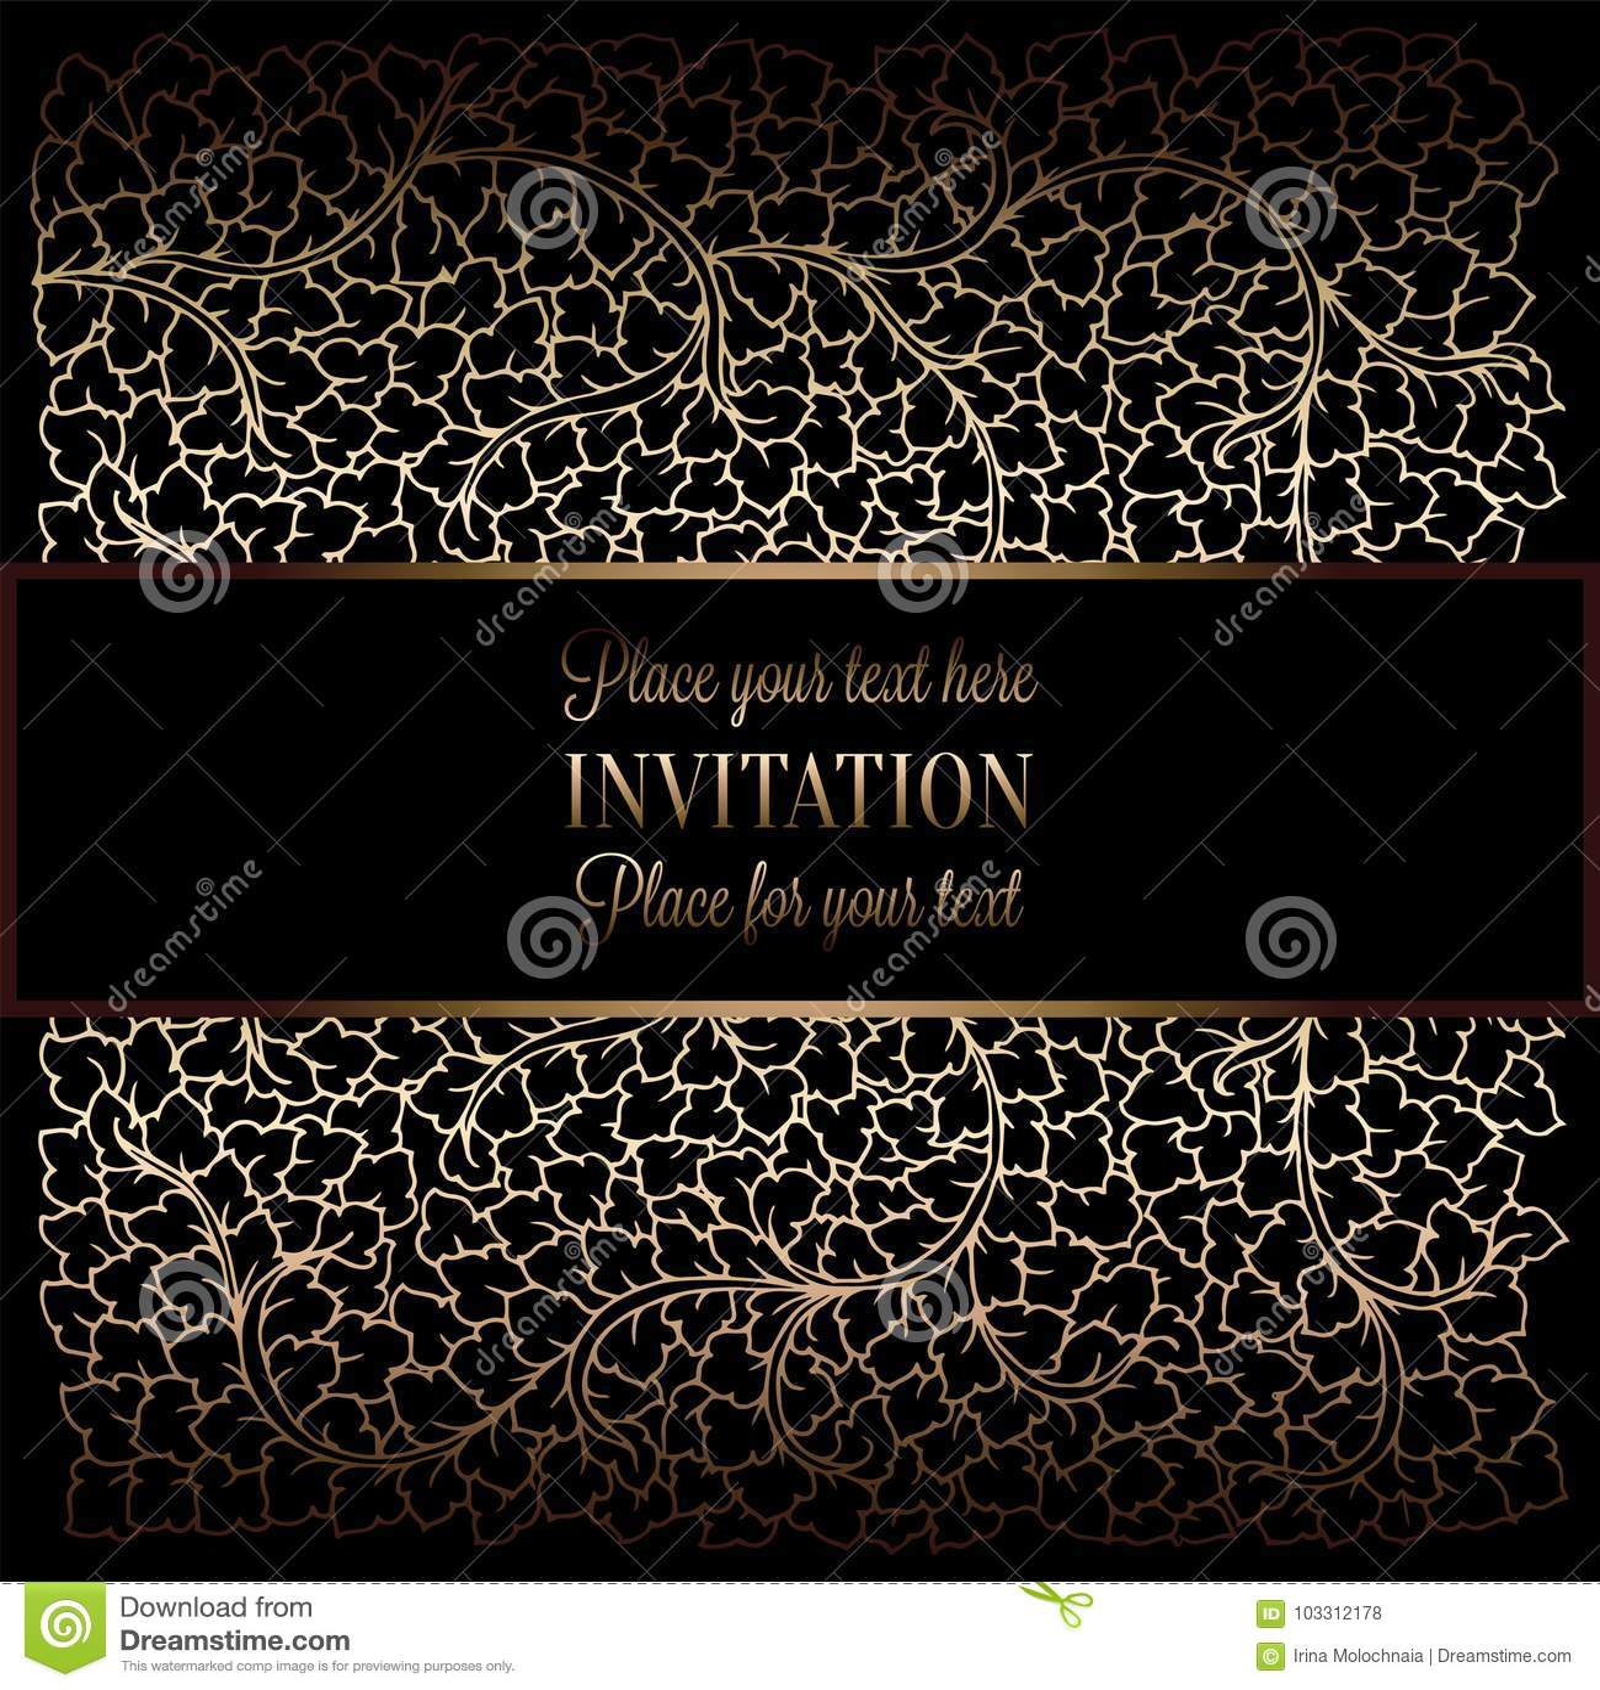 Fundo abstrato com antiguidade, preto luxuoso e quadro do vintage do ouro, bandeira do victorian, ornamento do papel de parede fl